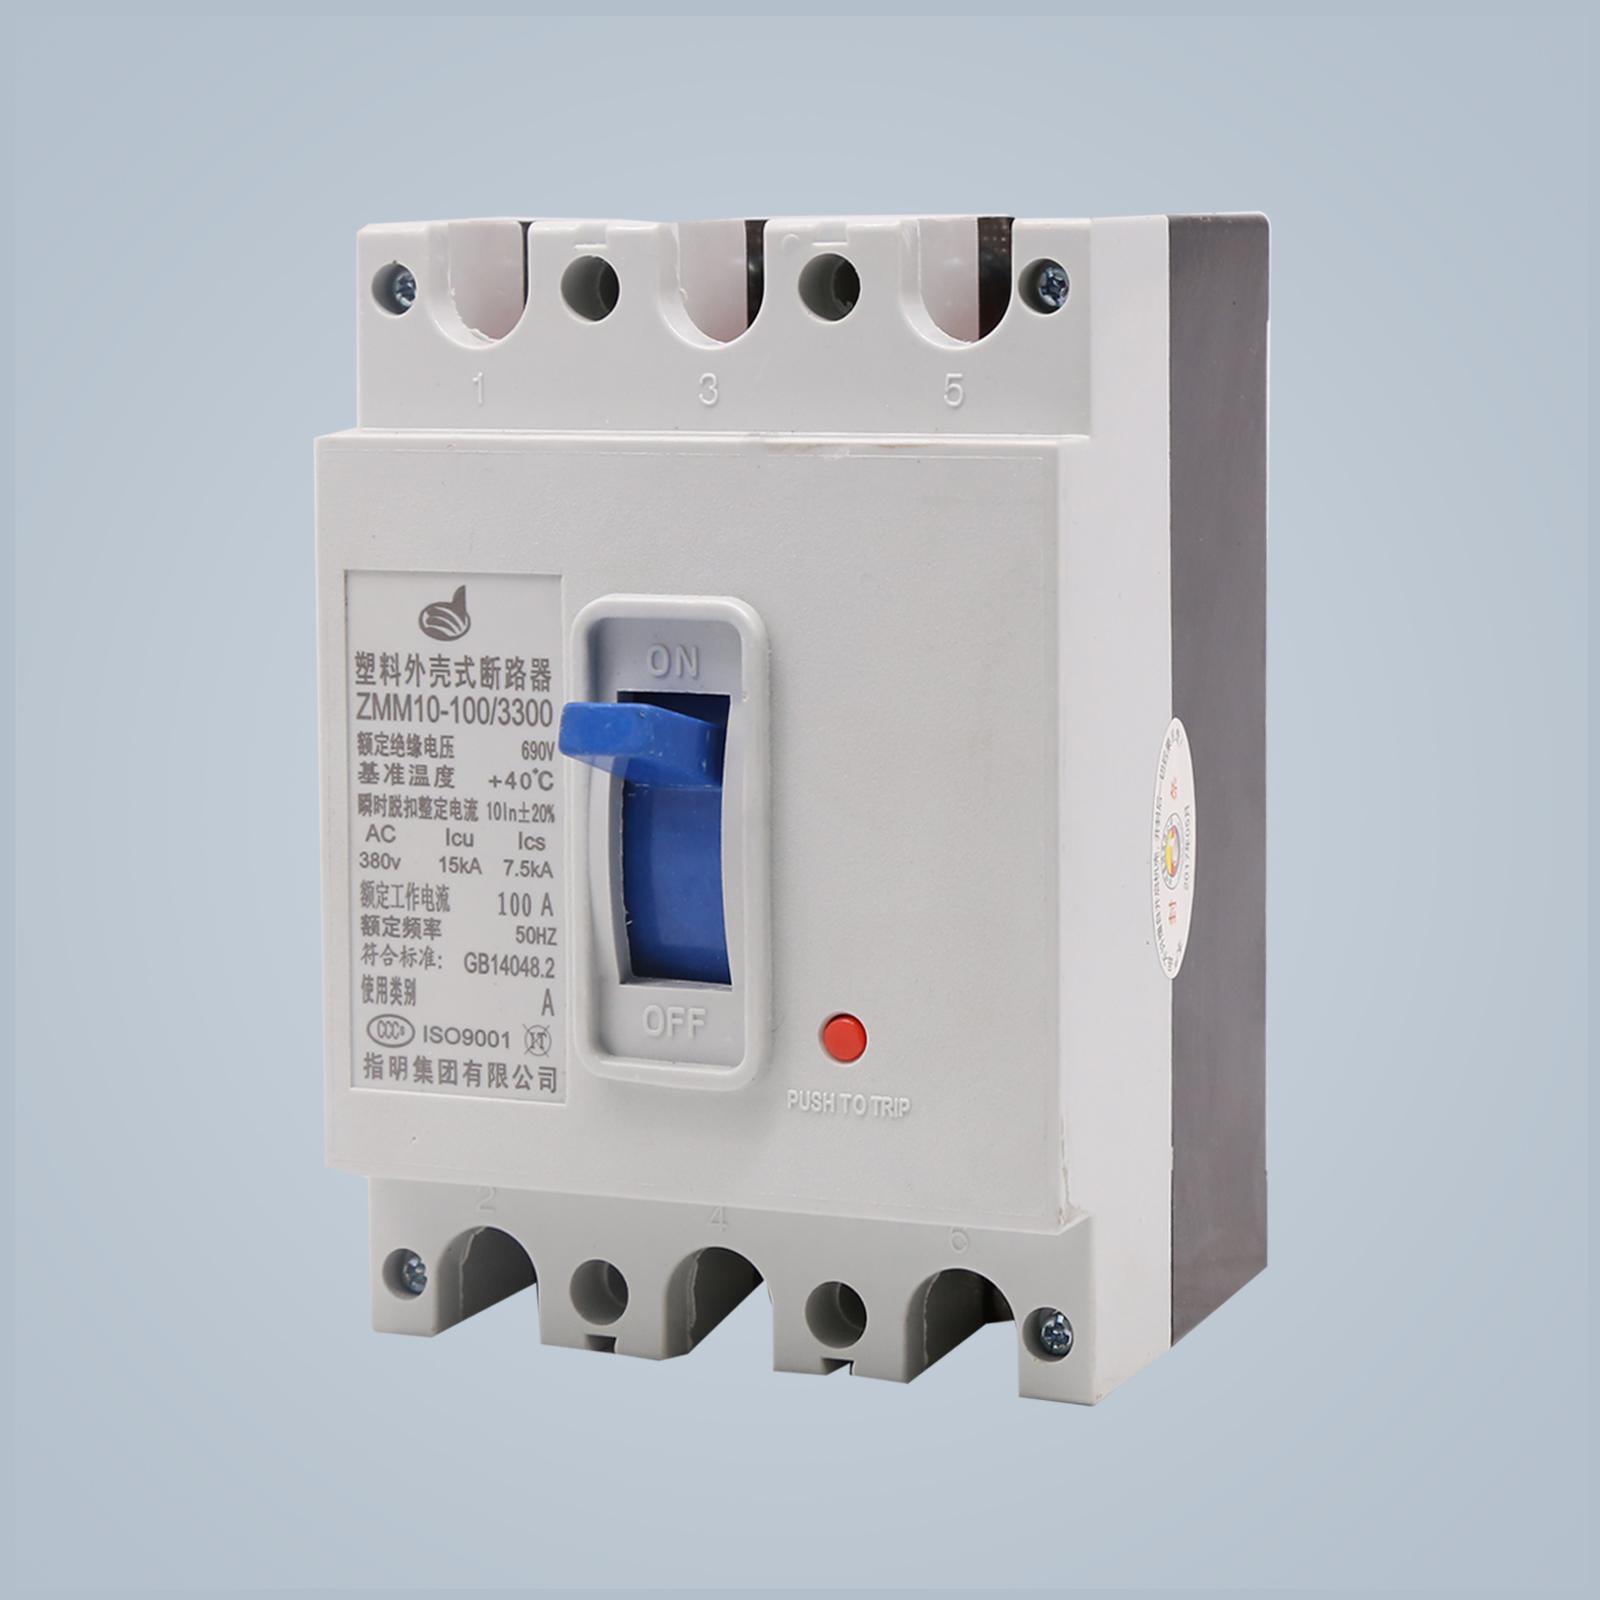 ZMM10 Molded Case Circuit Breaker ZHIMING GROUP CO LTD